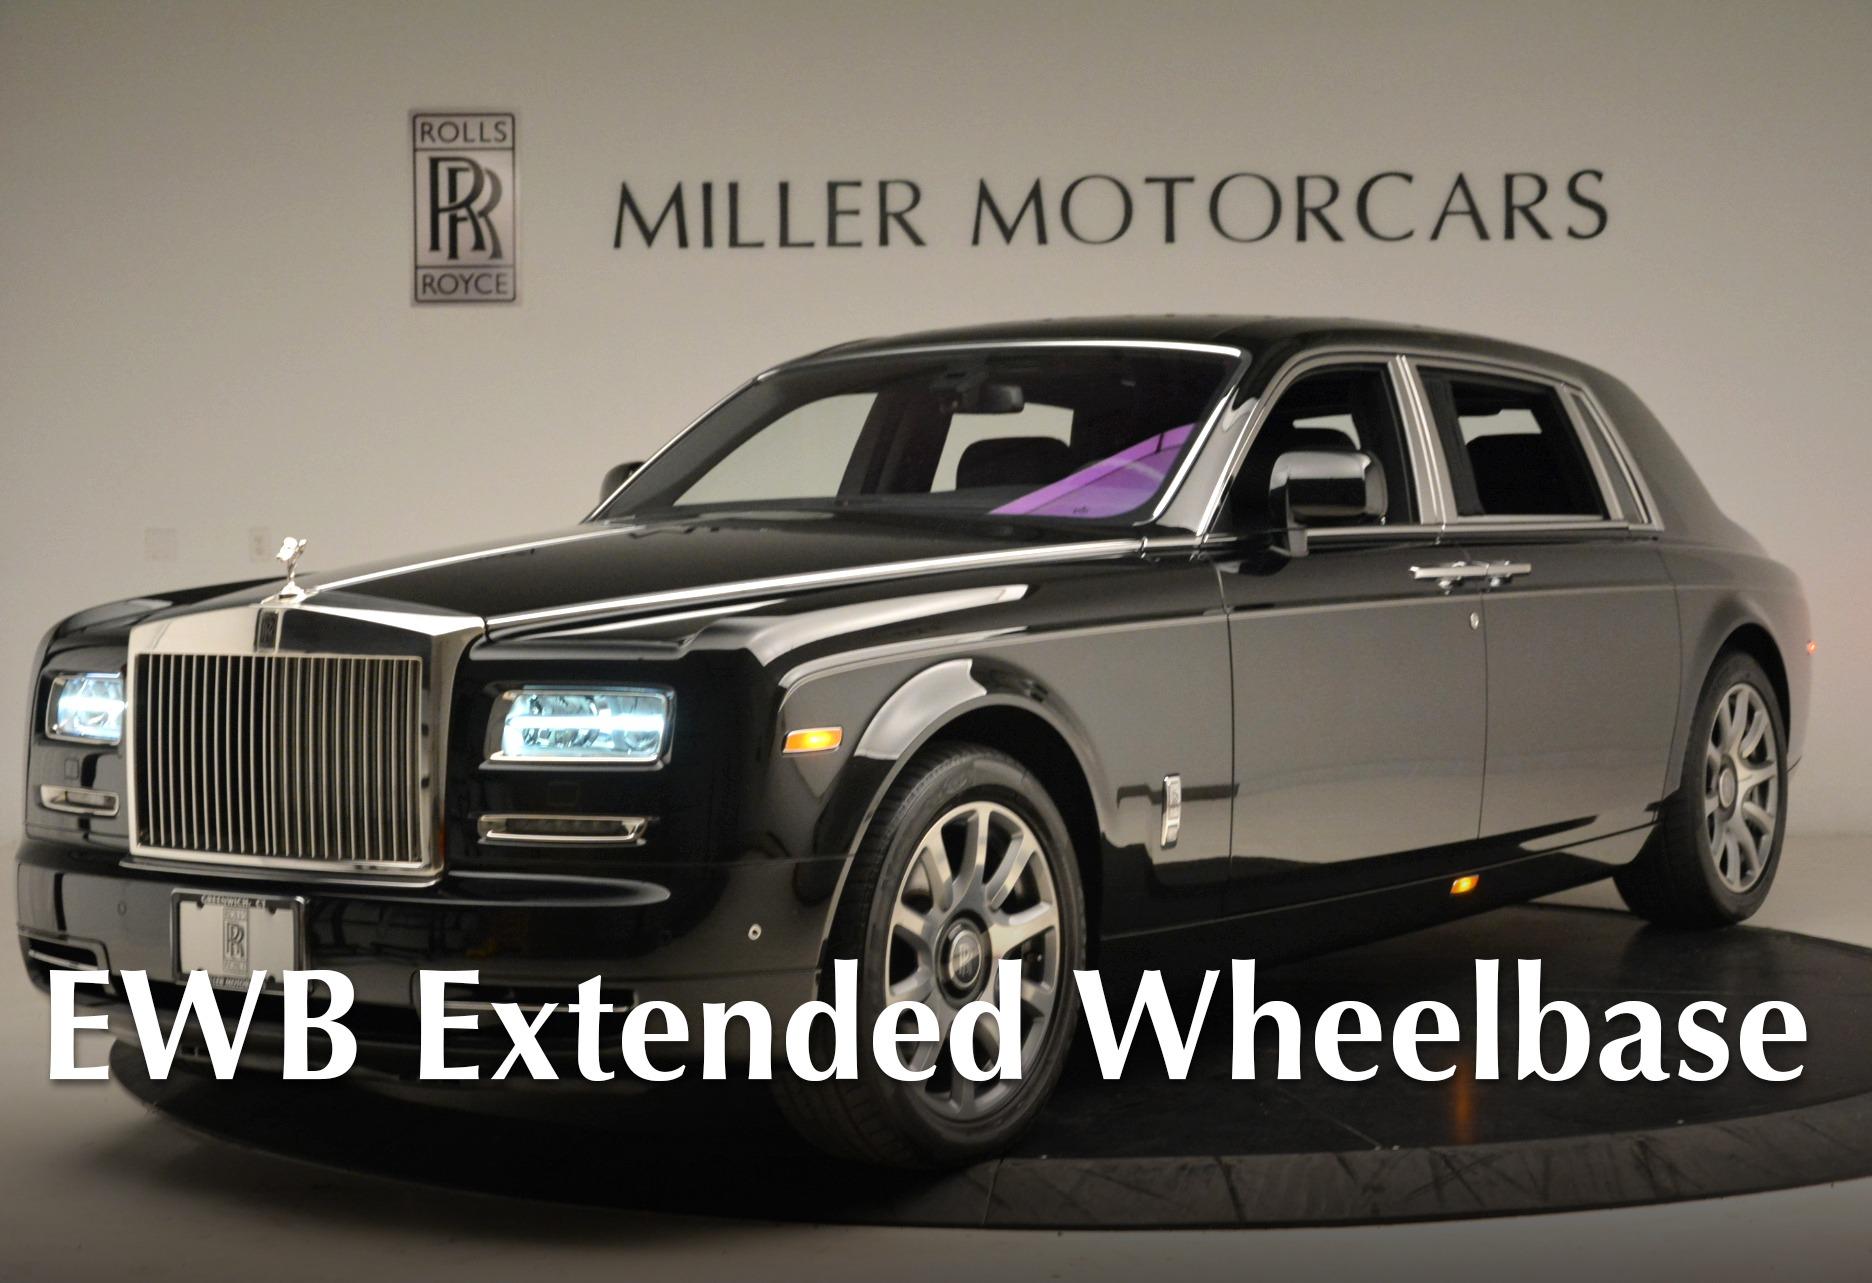 Used 2014 Rolls-Royce Phantom EWB For Sale In Greenwich, CT. Alfa Romeo of Greenwich, 7319 2051_main